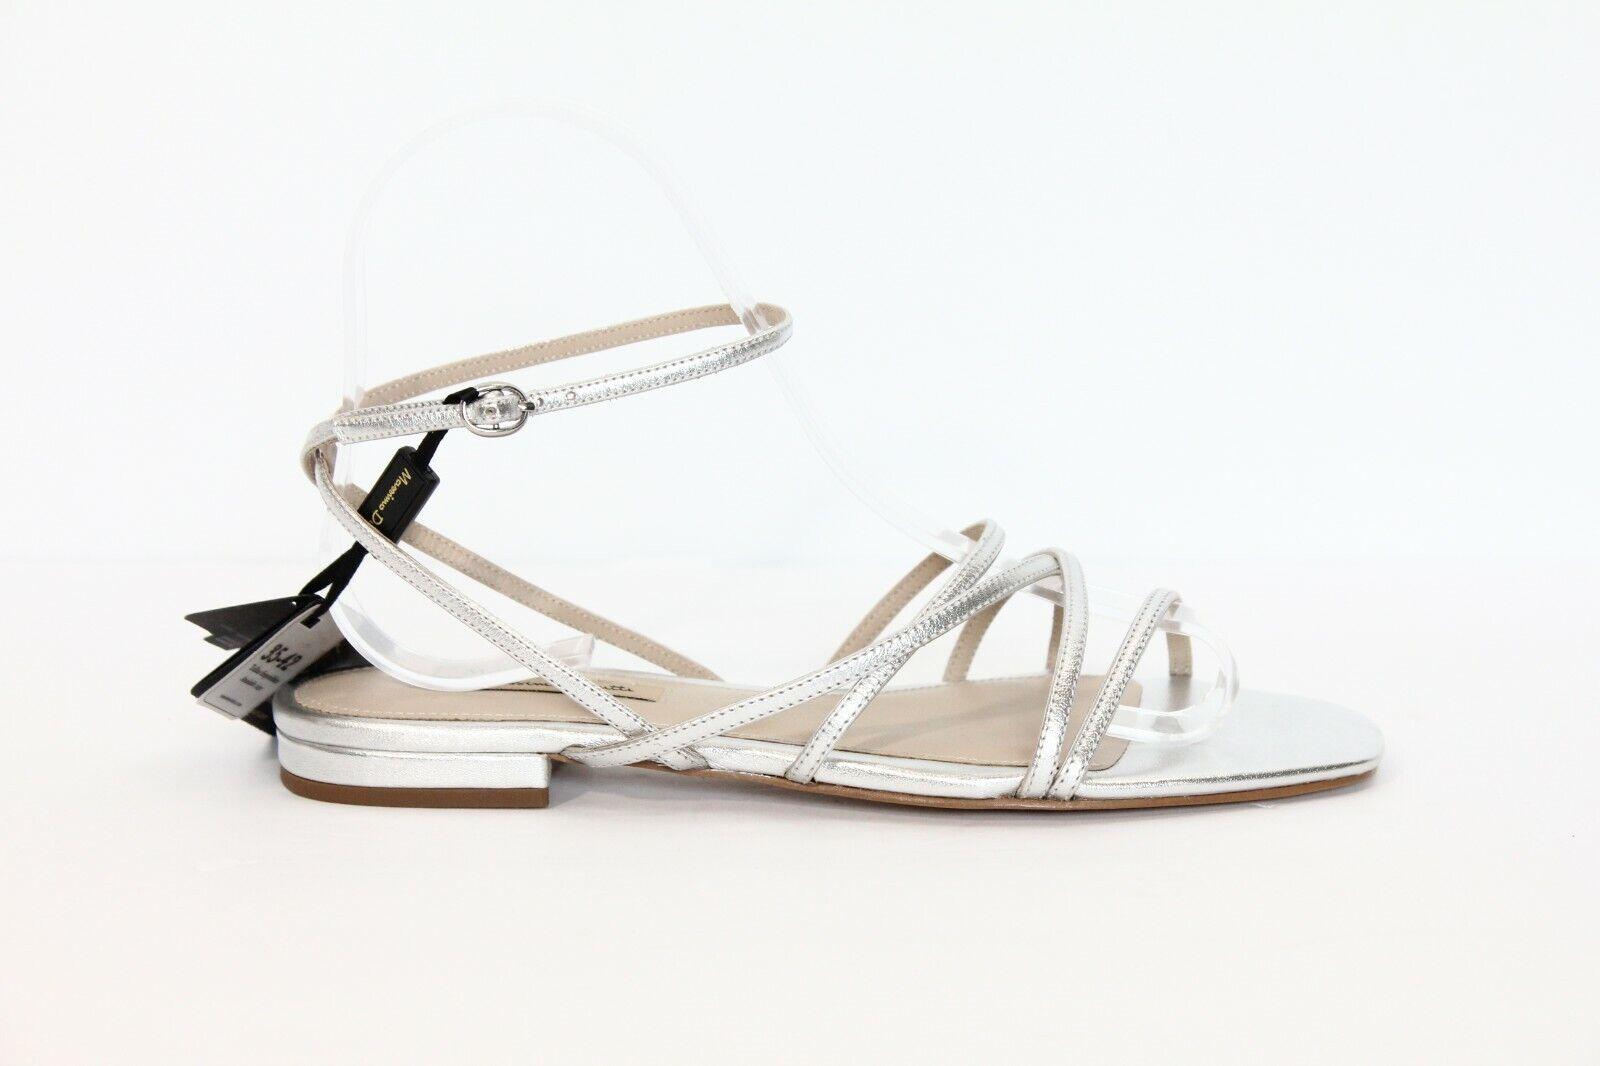 toma Zapatos De Cuero Massimo DUTTI sandalias Plata Estilo Estilo Estilo De Gladiador Nuevo Mujeres Plana  directo de fábrica